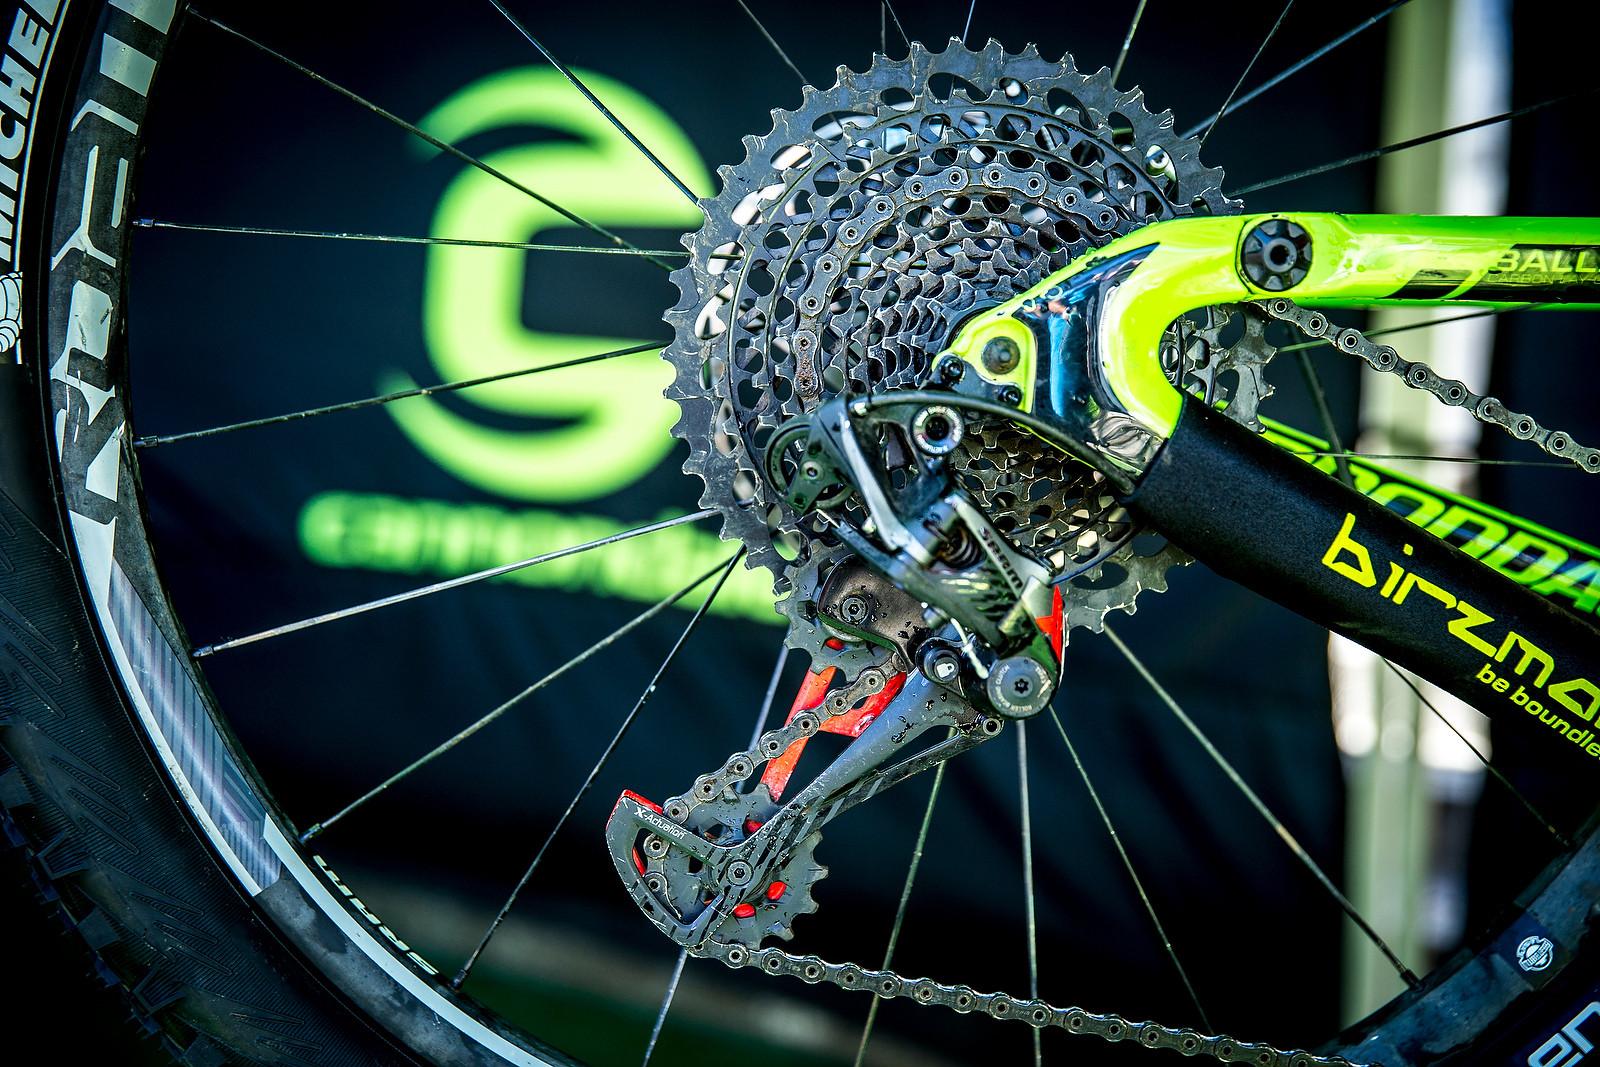 Jerome Clementz's Eagle 50t Cassette - PIT BITS - Enduro World Series, Corral, Chile - Mountain Biking Pictures - Vital MTB